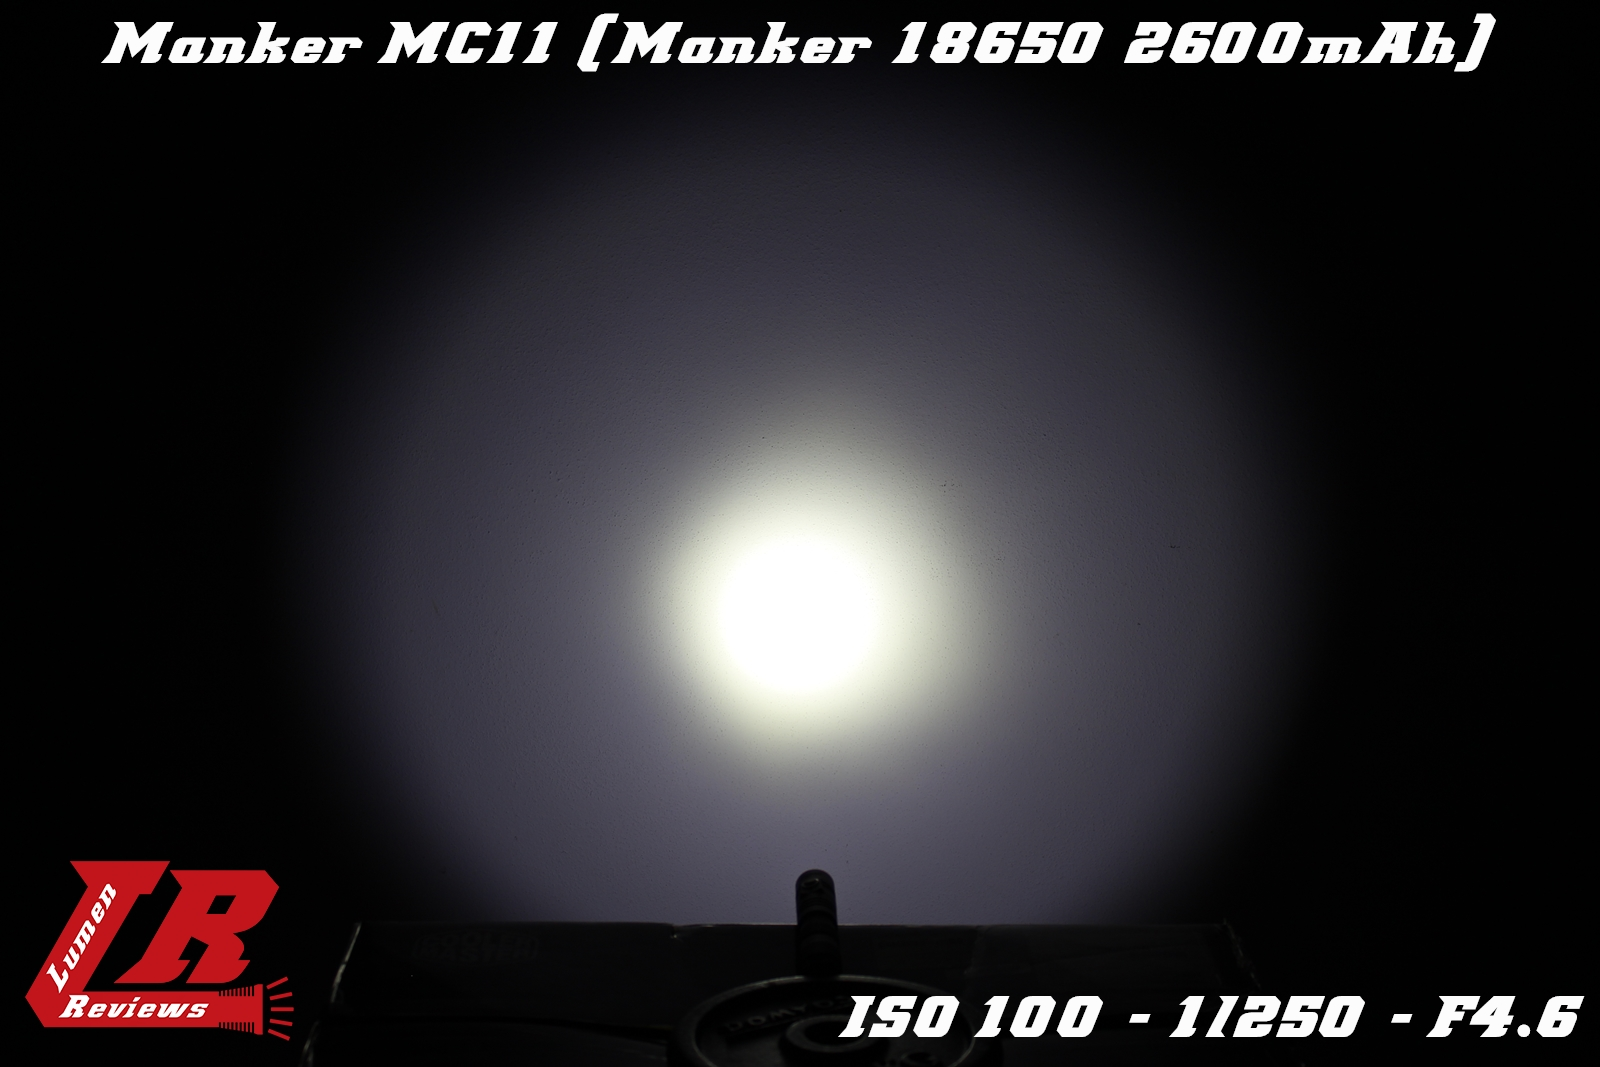 Manker MC11 BS 5